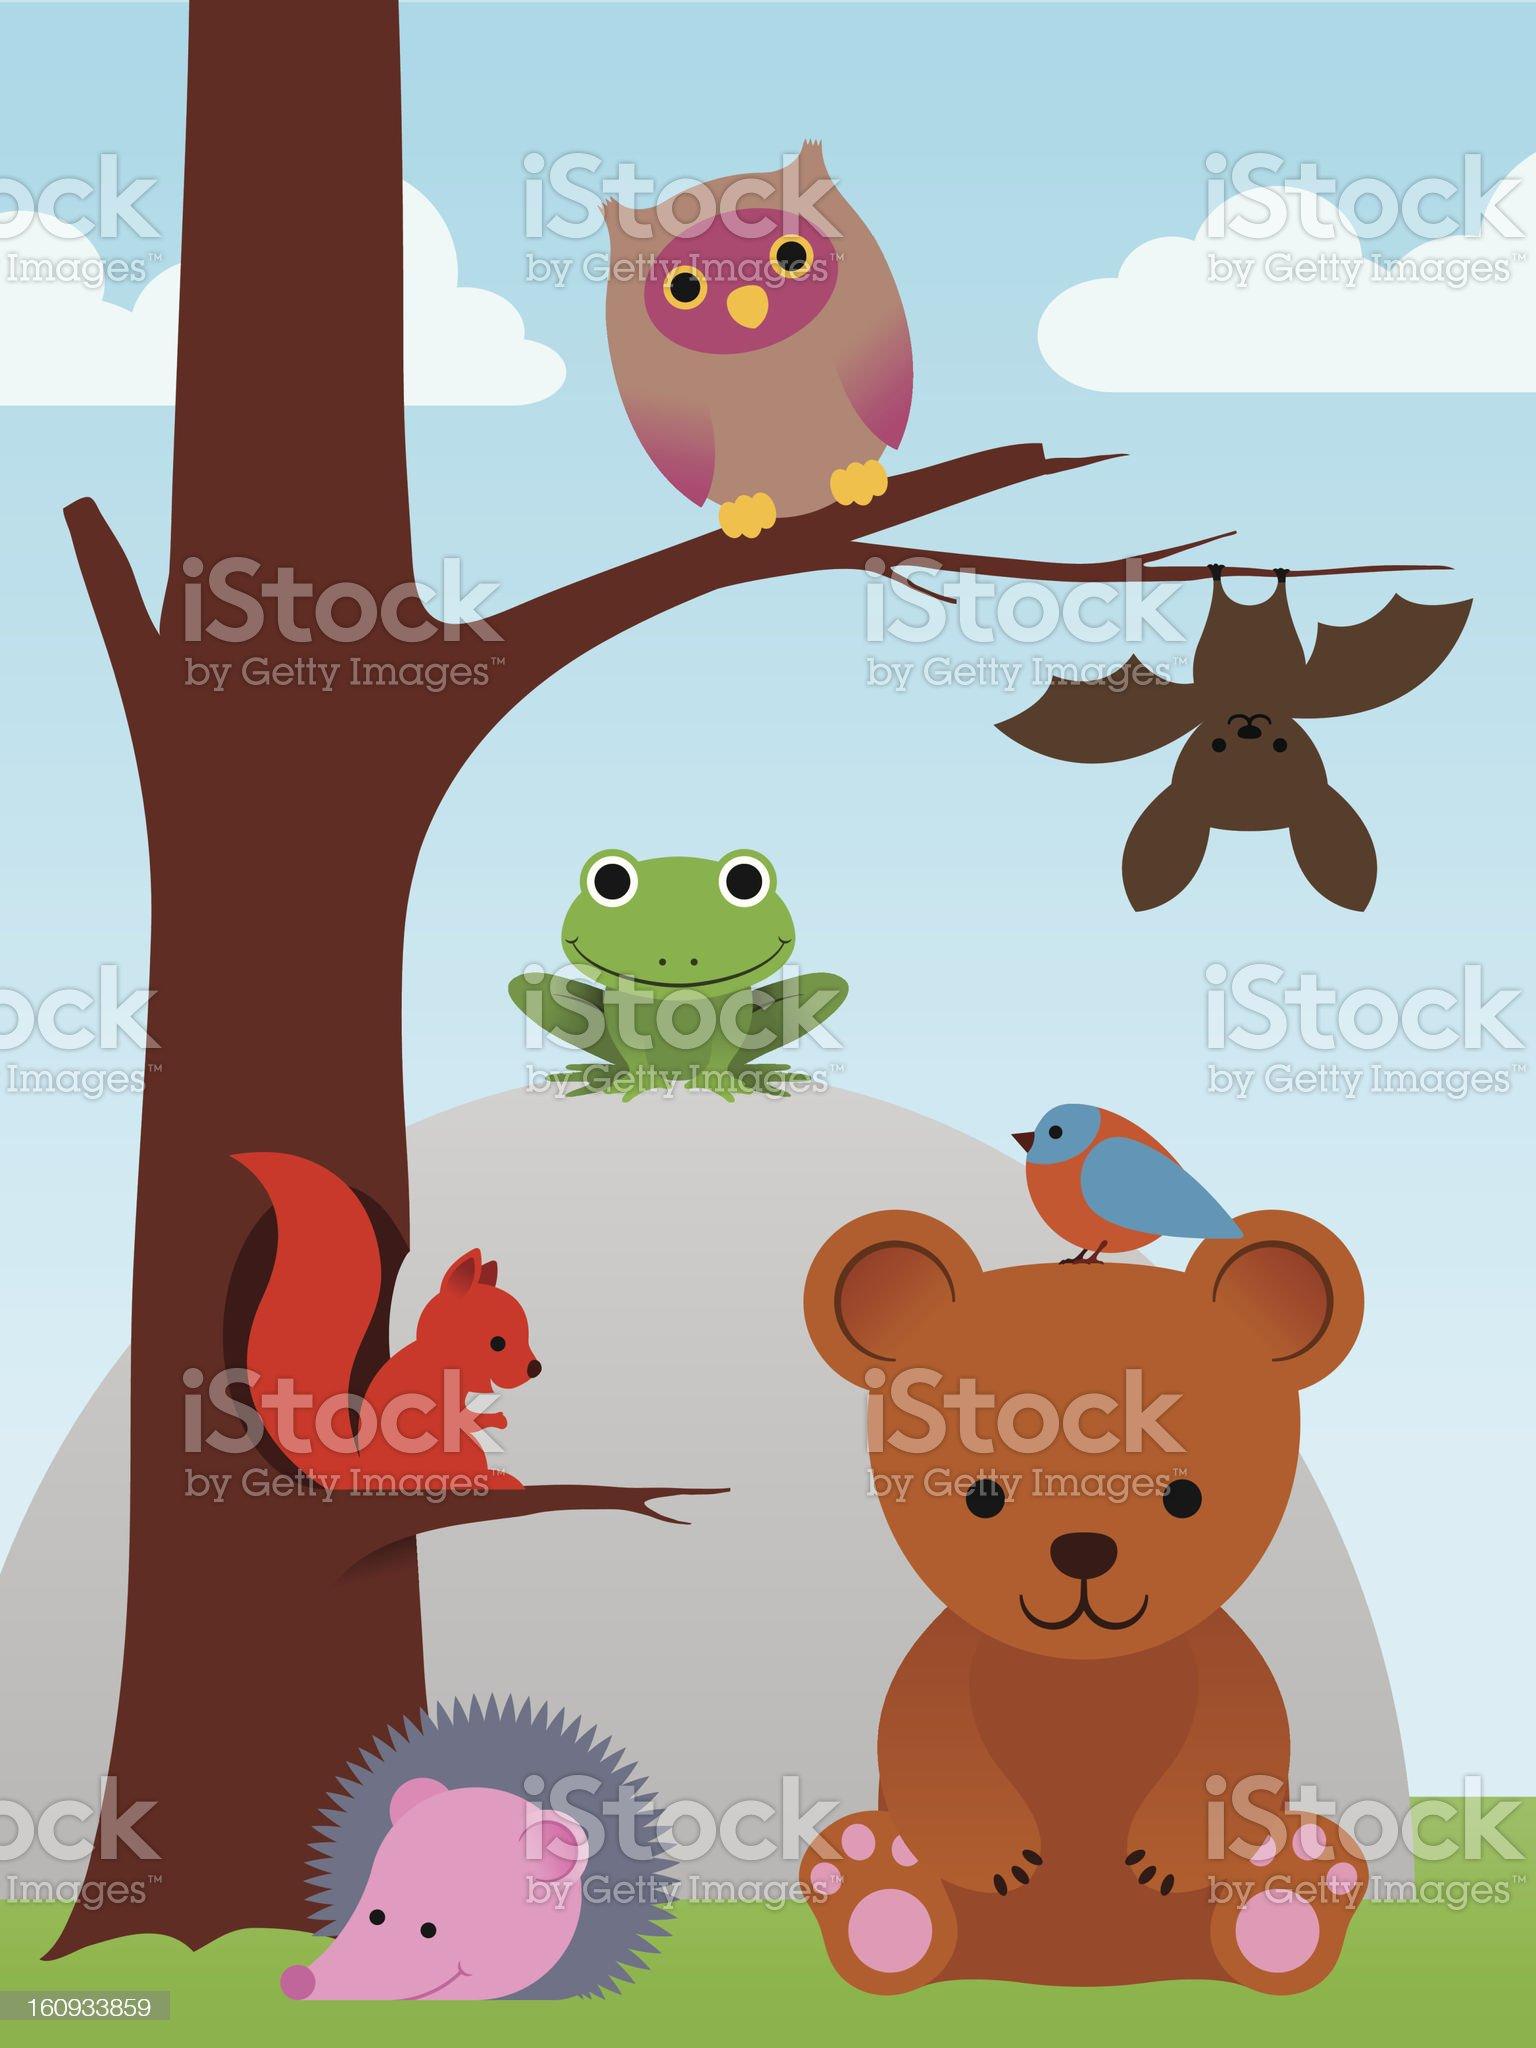 Cartoon animal collection royalty-free stock vector art